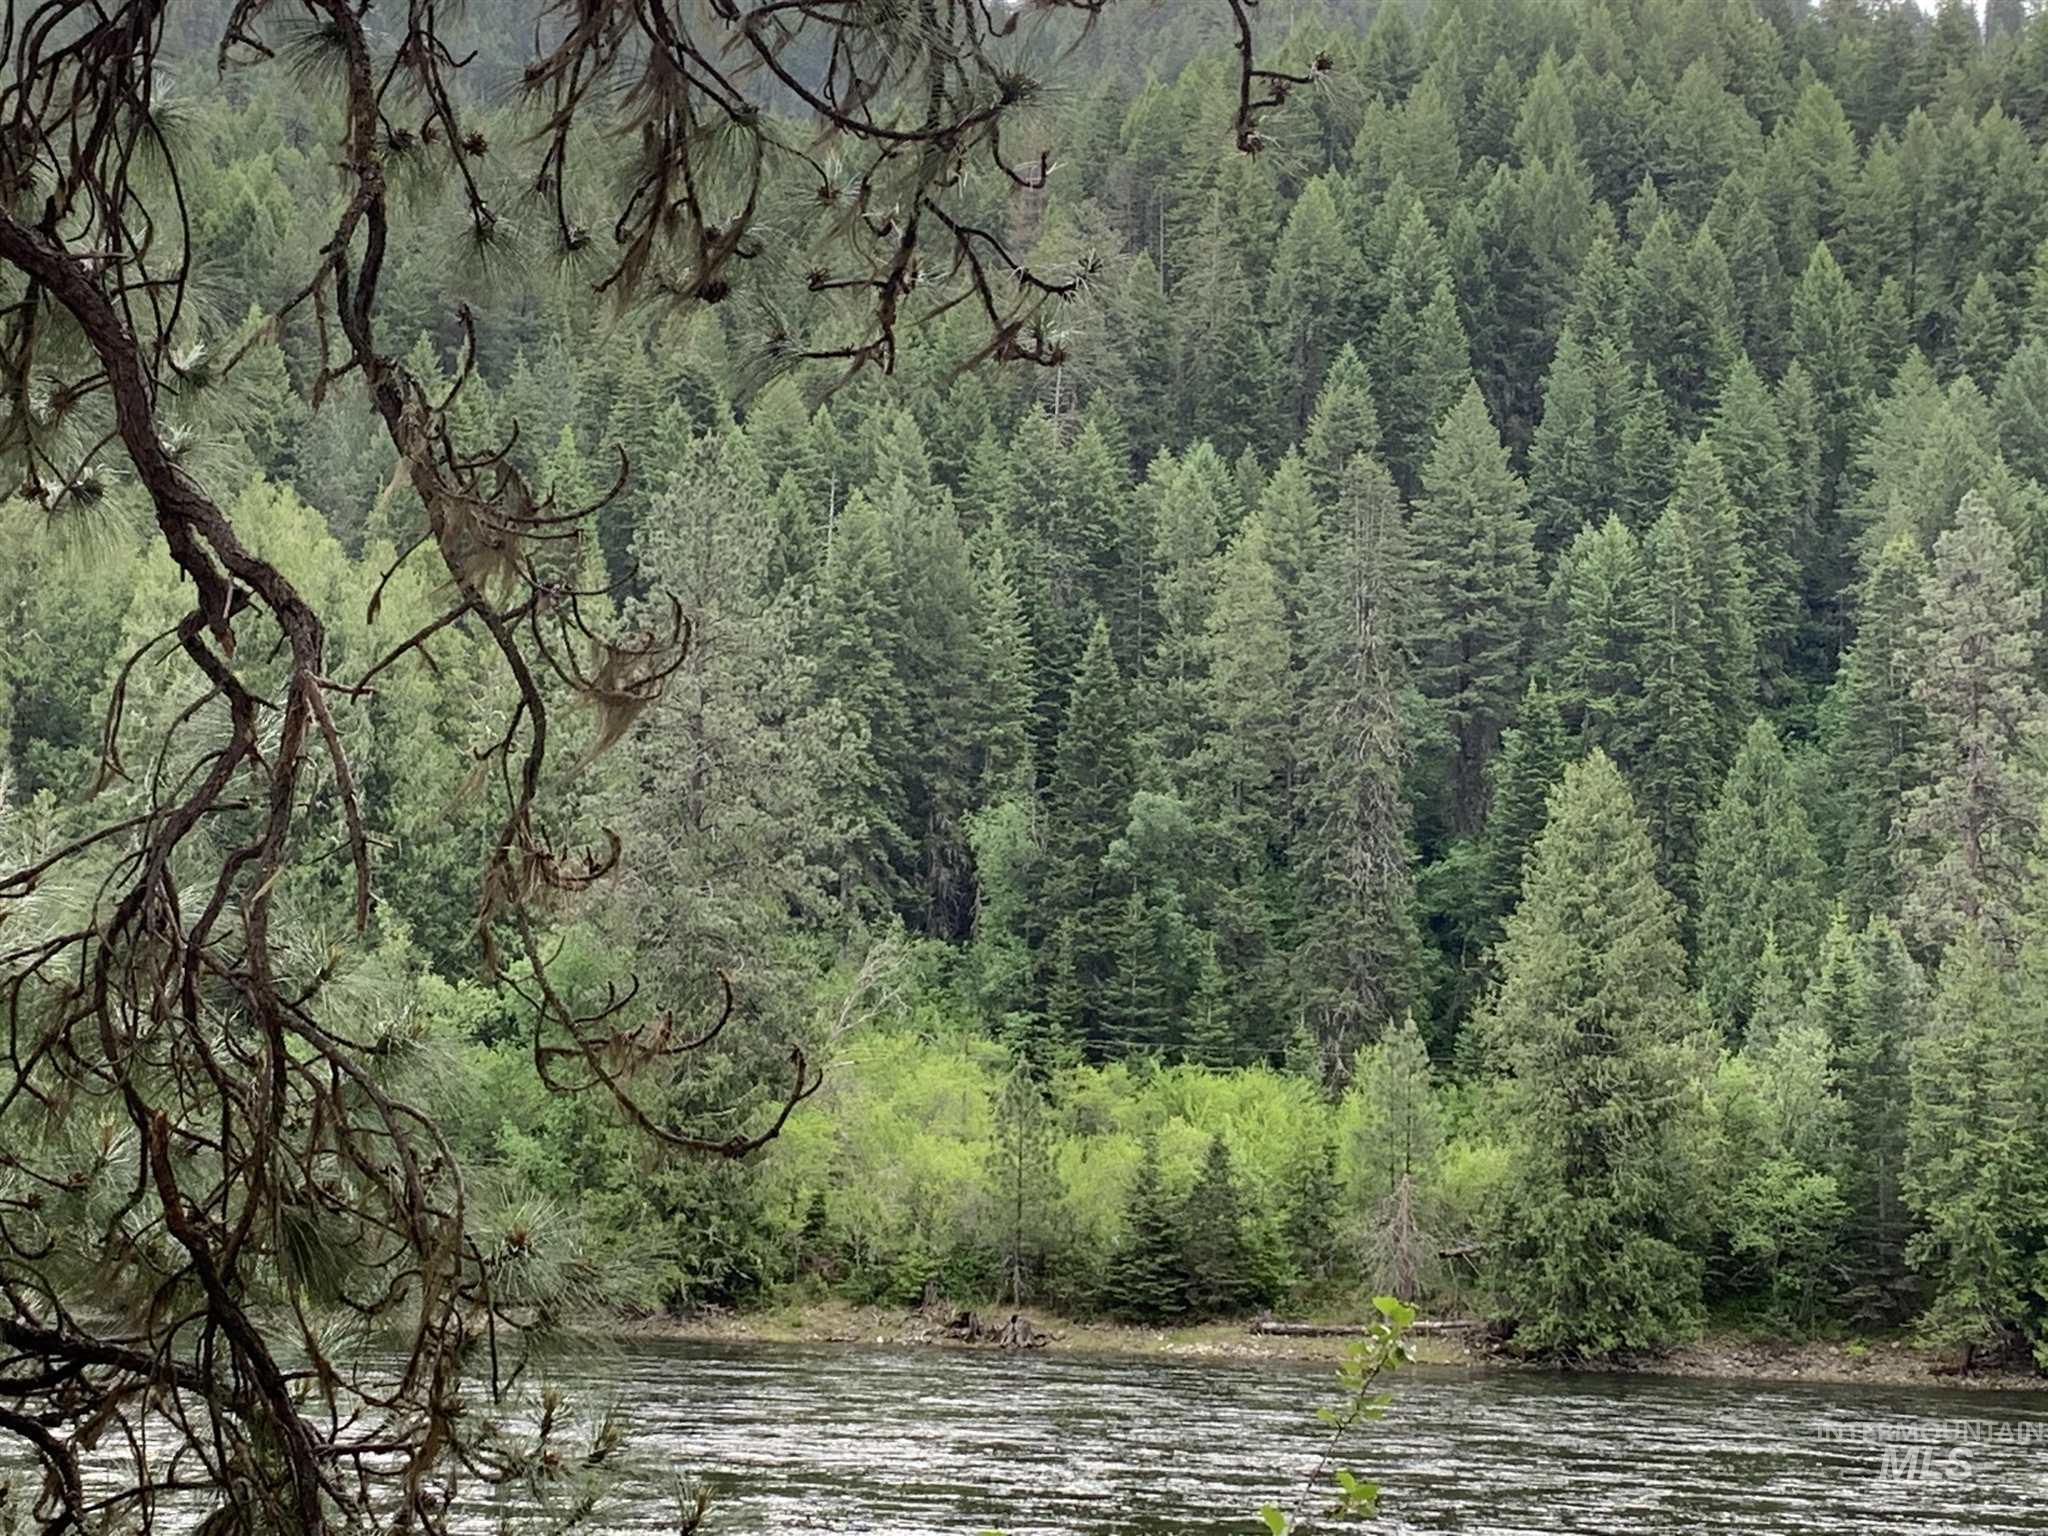 000 Highway 12 - Across River Property Photo